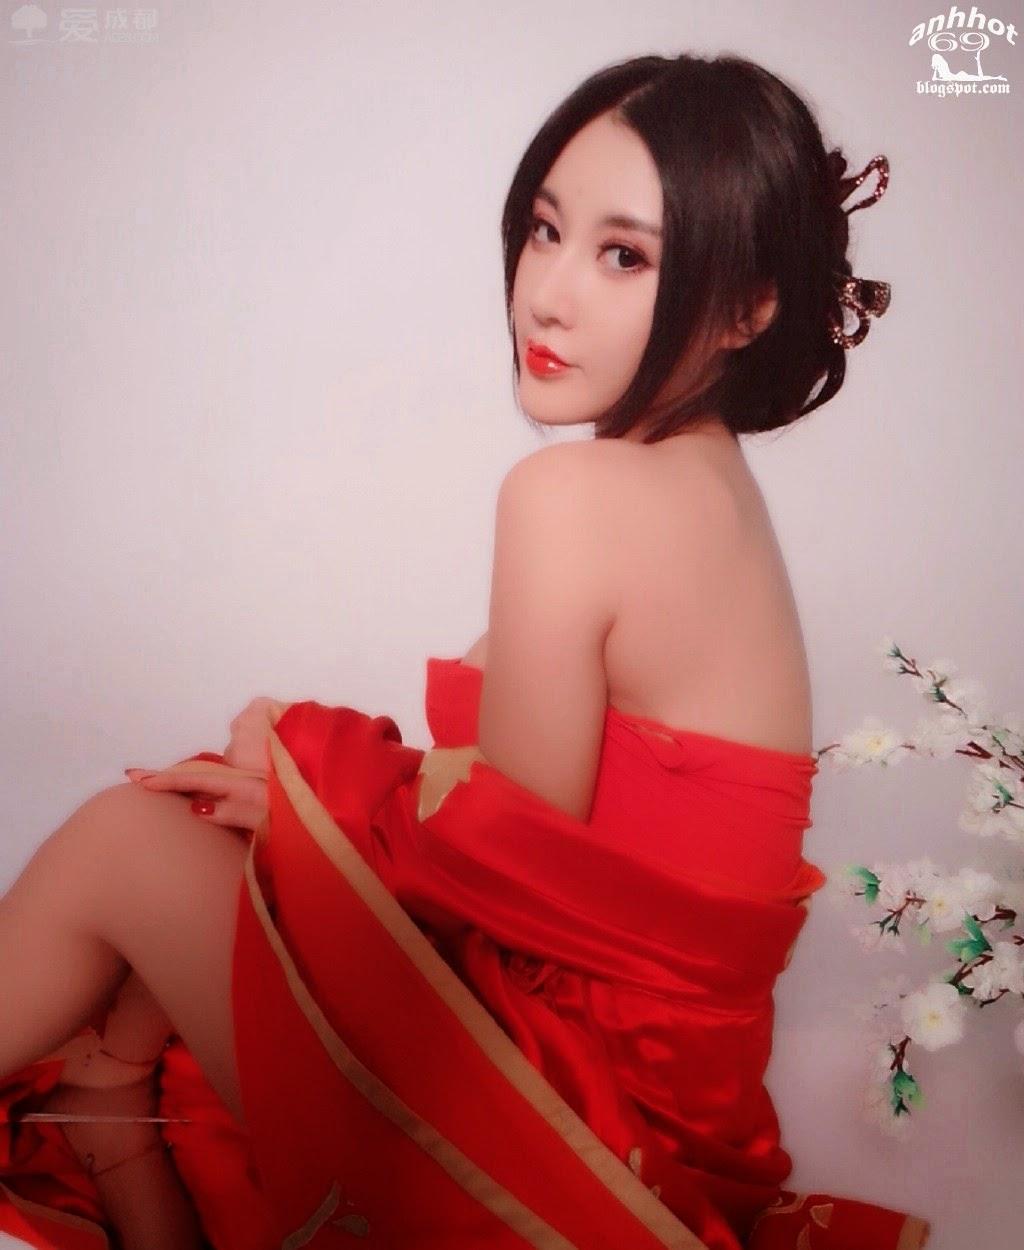 Fan-Ling_104919wdmahb931b9x20u2